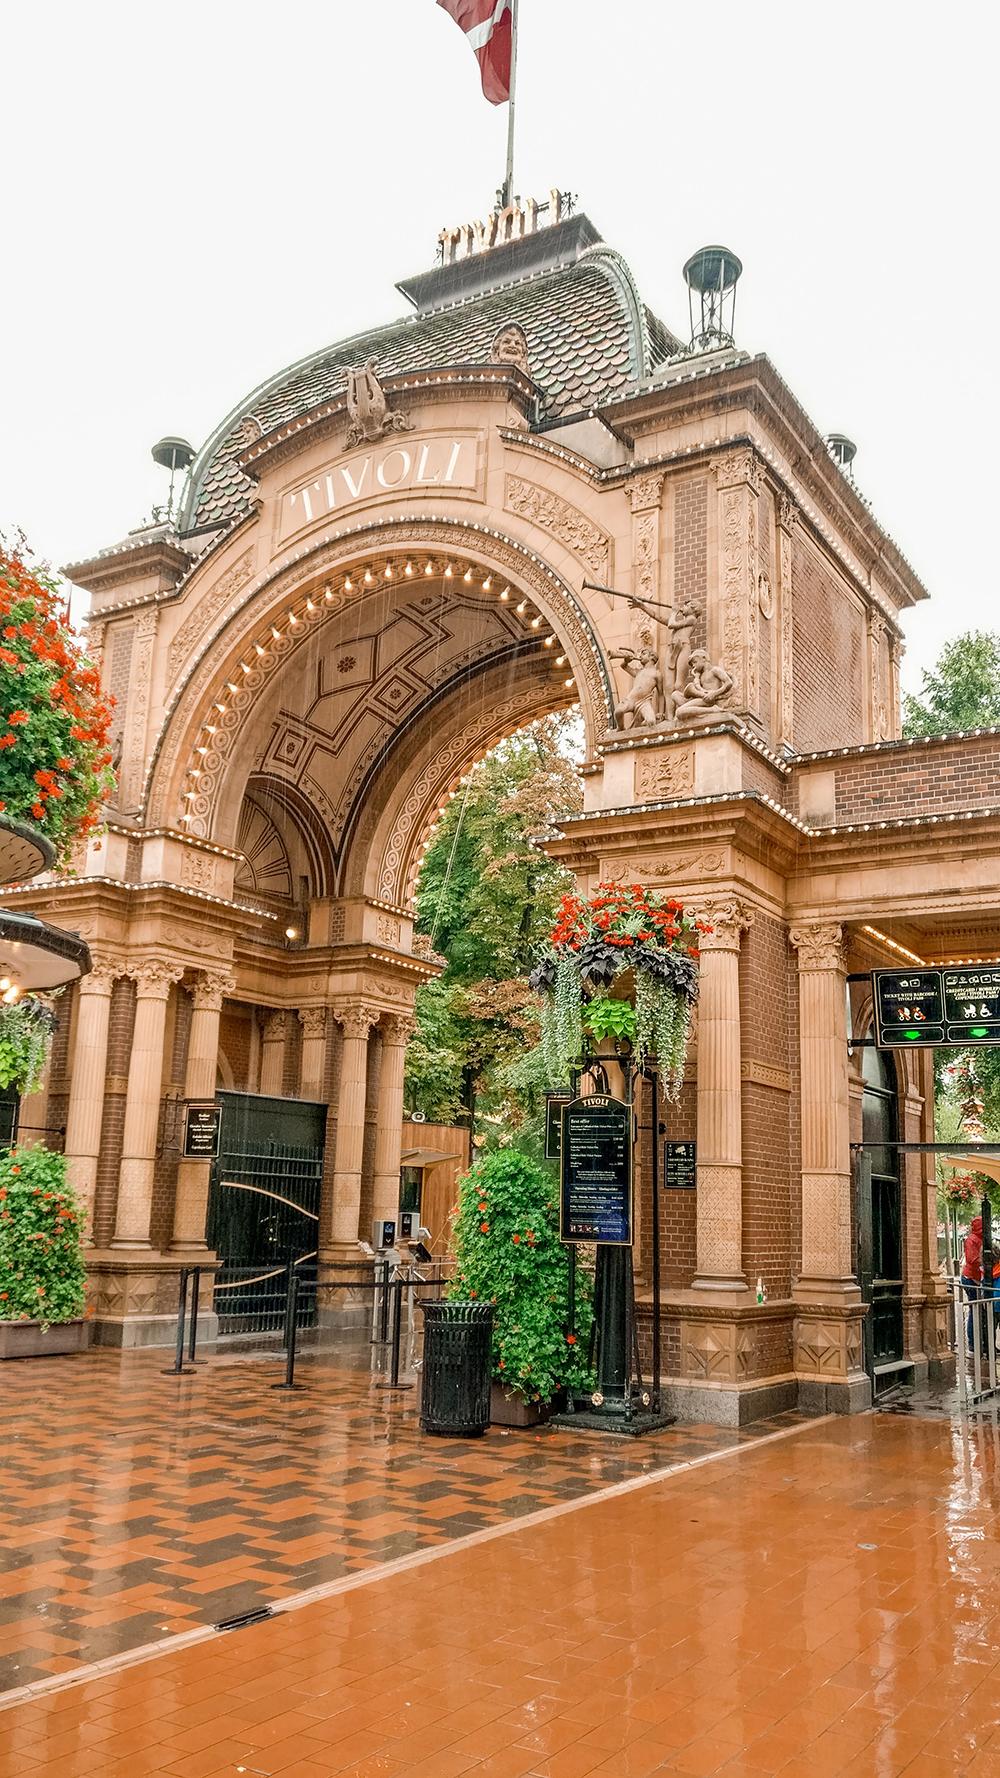 Tivoli Gardens - Copenhagen 3-day travel itinerary | Aliz's Wonderland